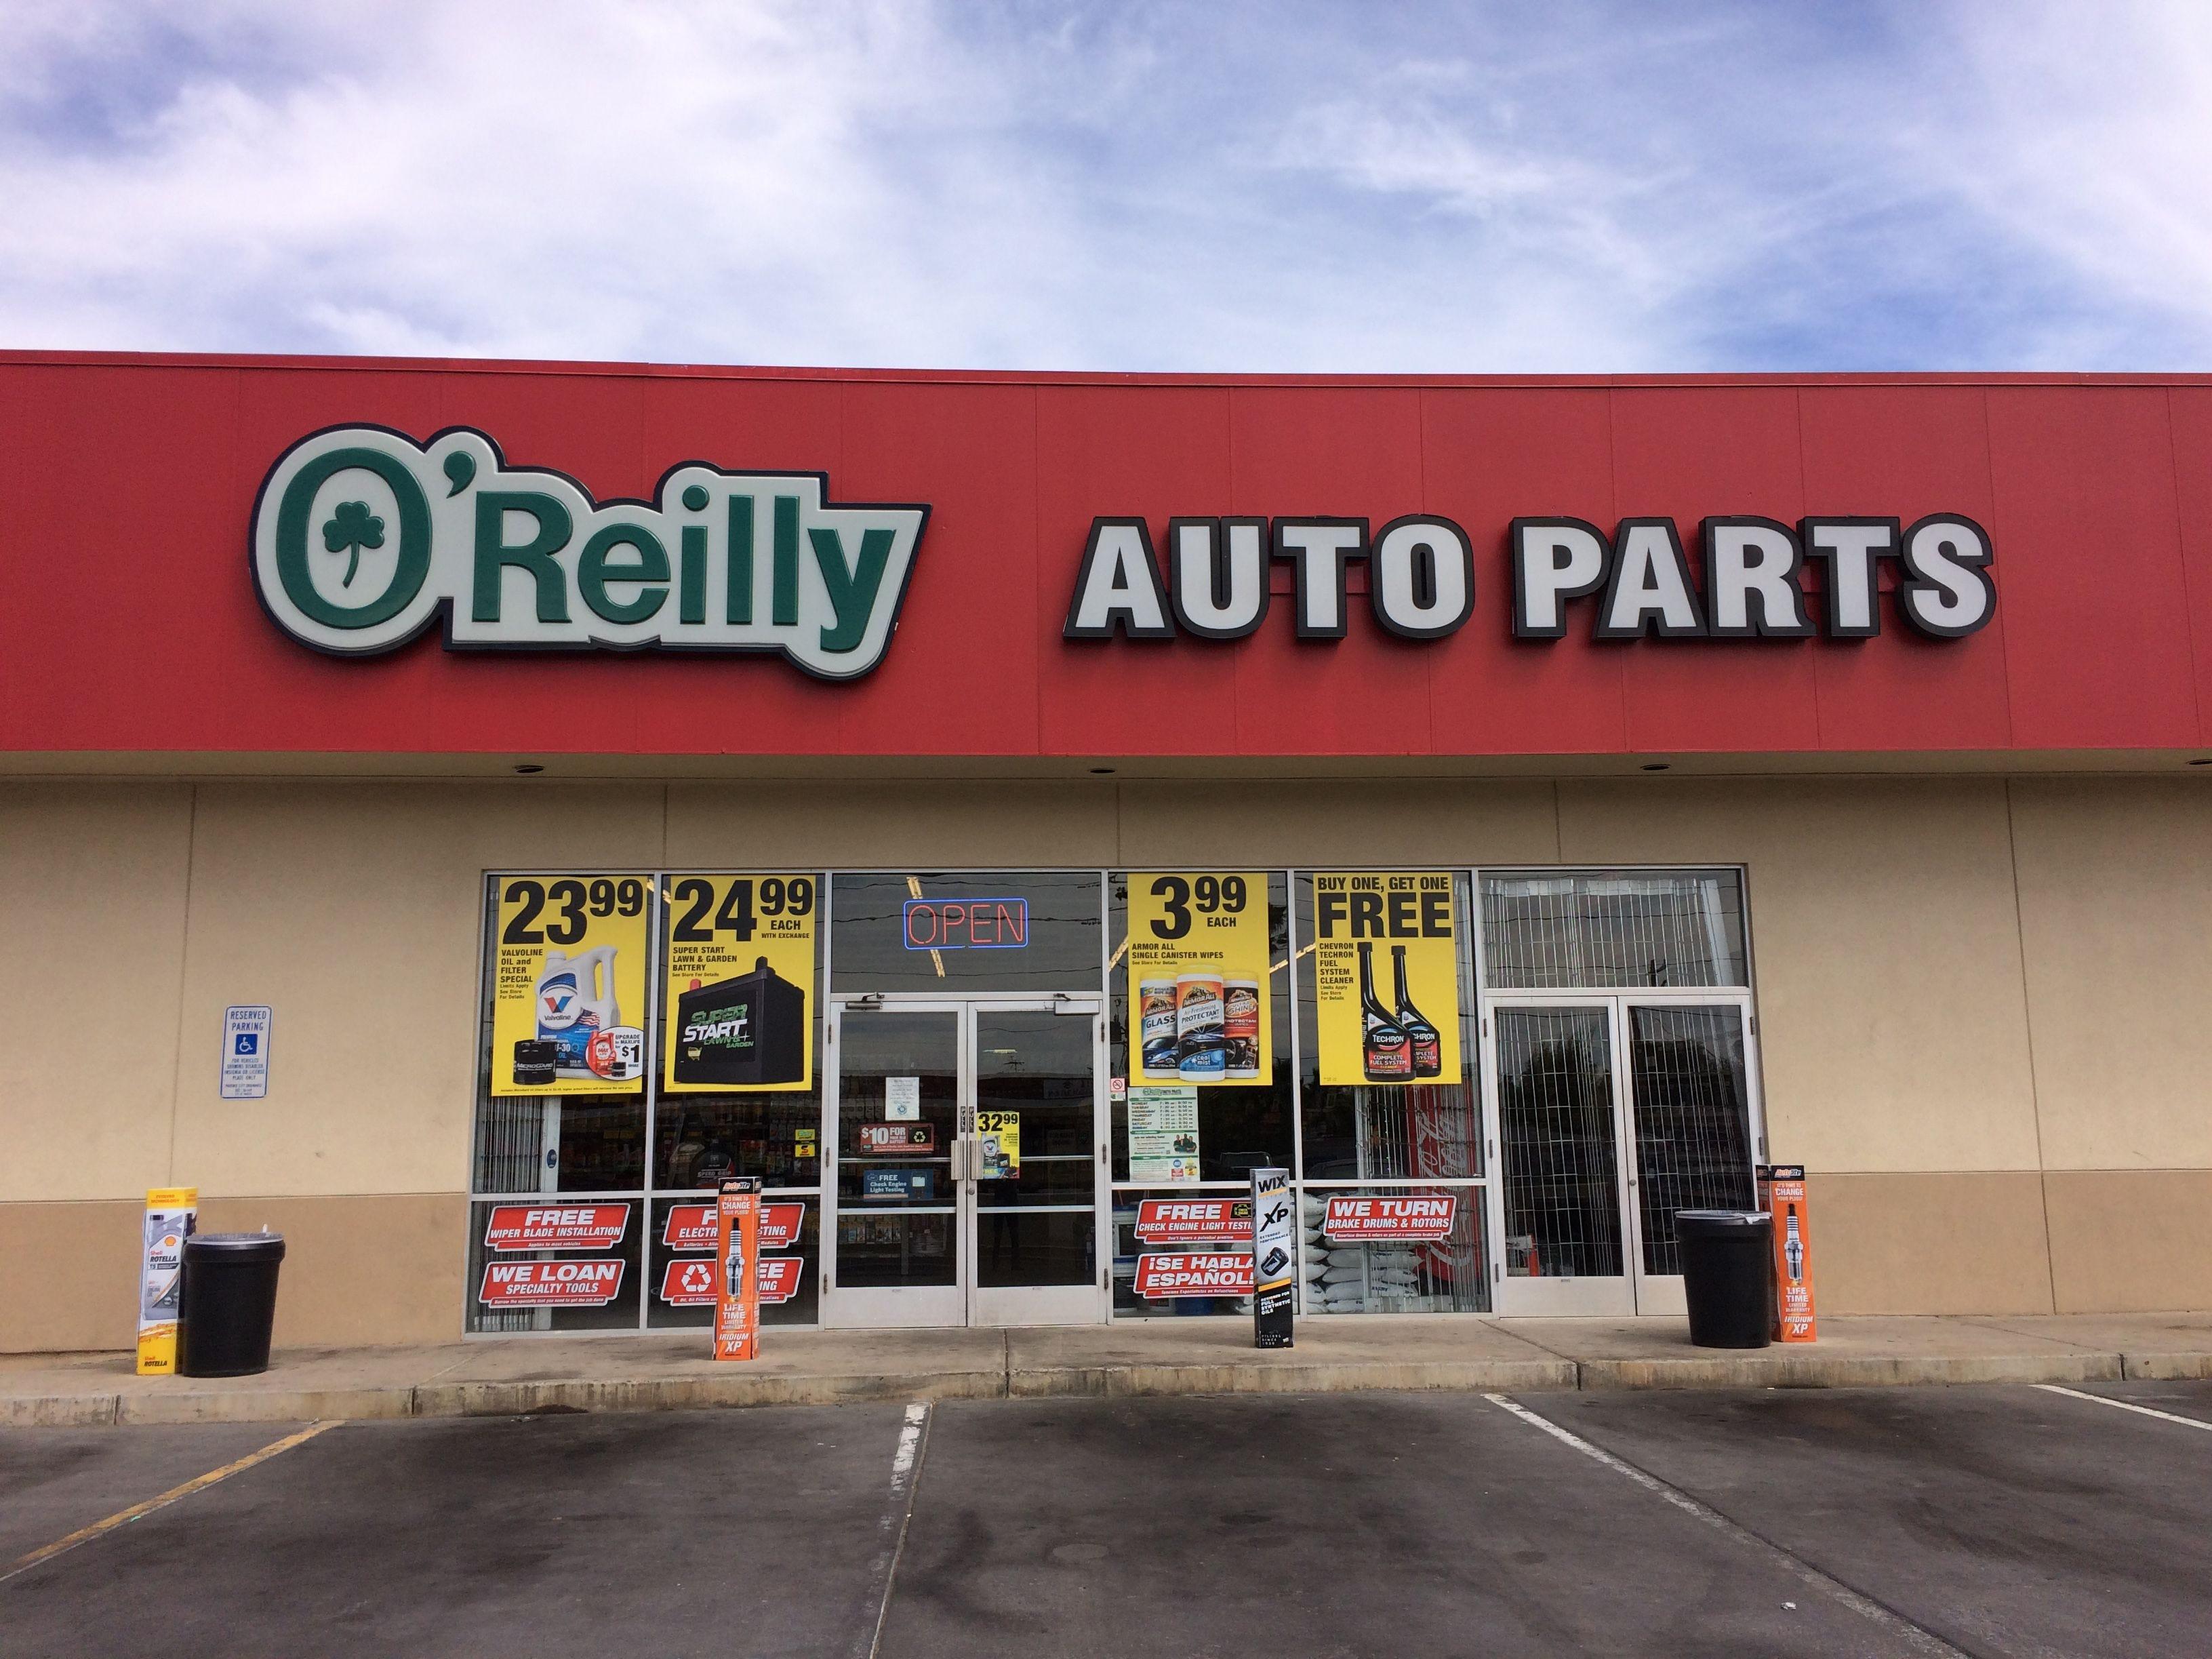 No. 85 (tie): O'Reilly Automotive Inc. | Auto-parts stores | 2019 employees: 2,100e (estimated by Arizona Republic) | 2018 employees: 2,420 | Ownership: Public | Headquarters: Springfield, Missouri | www.oreillyauto.com